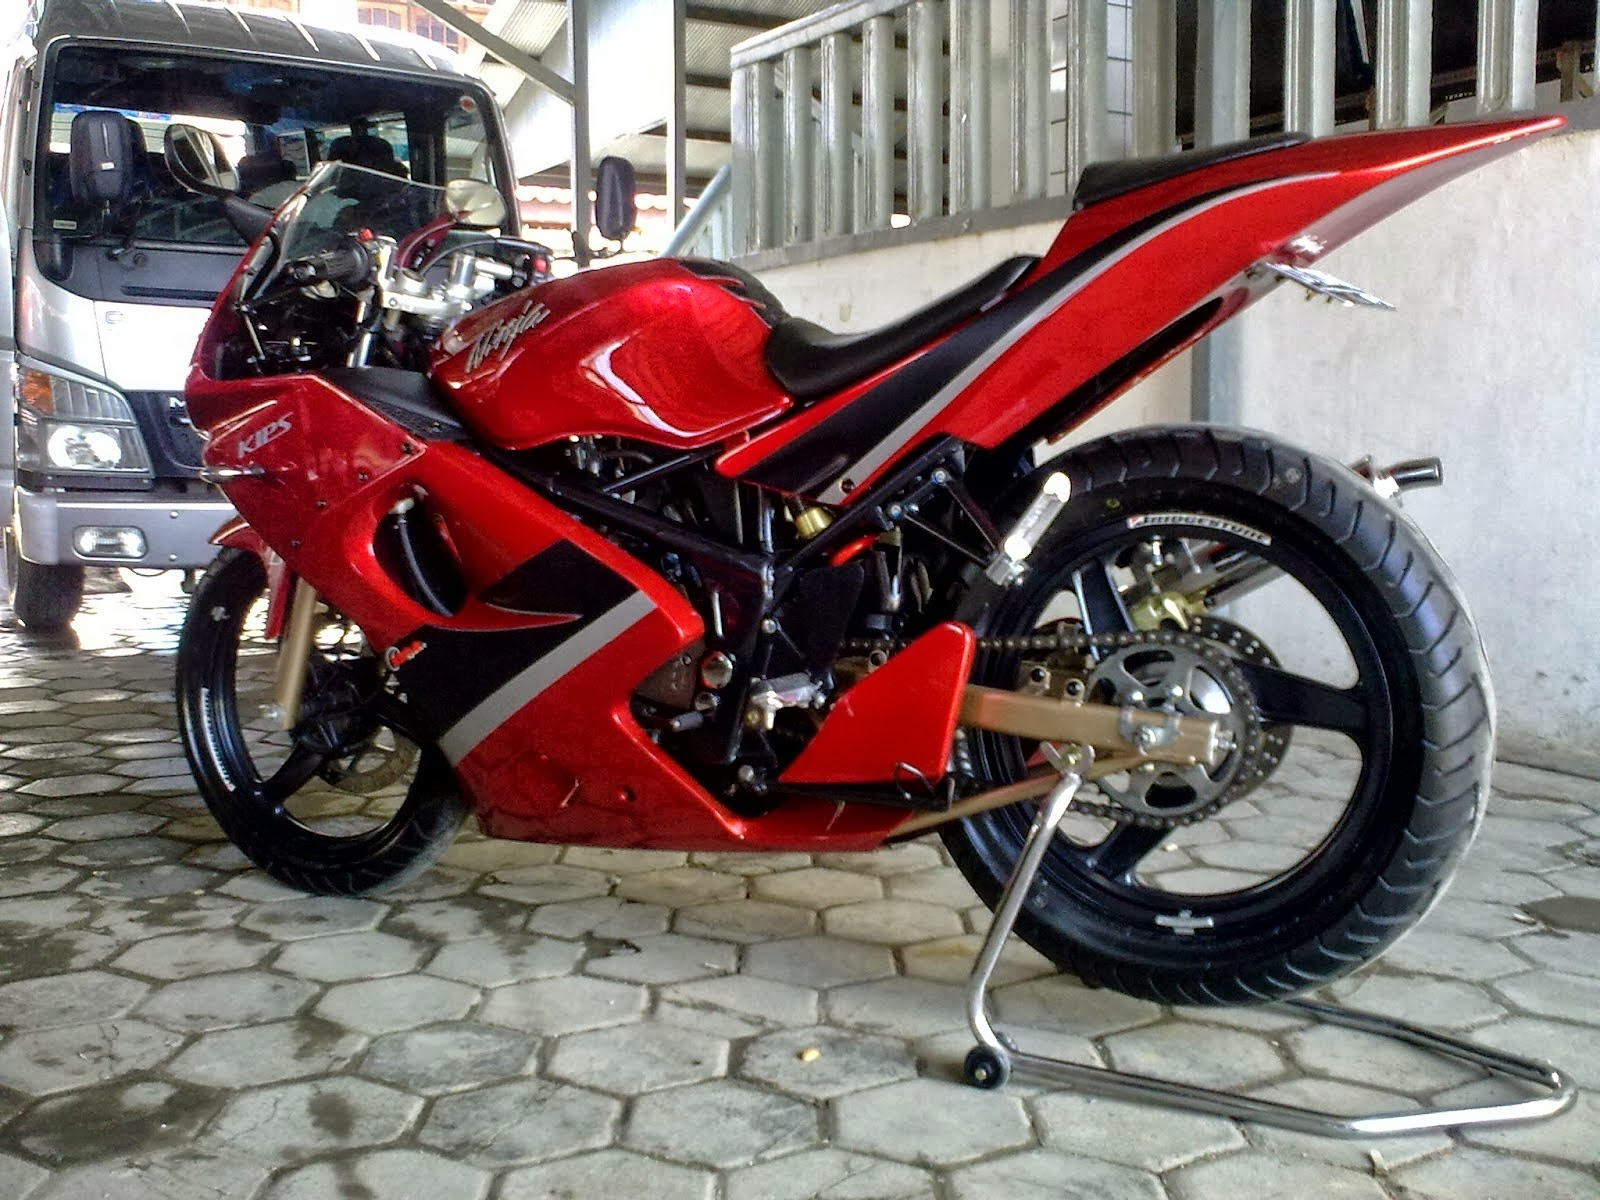 Modifikasi Motor Kawasaki Ninja Versi Superbike